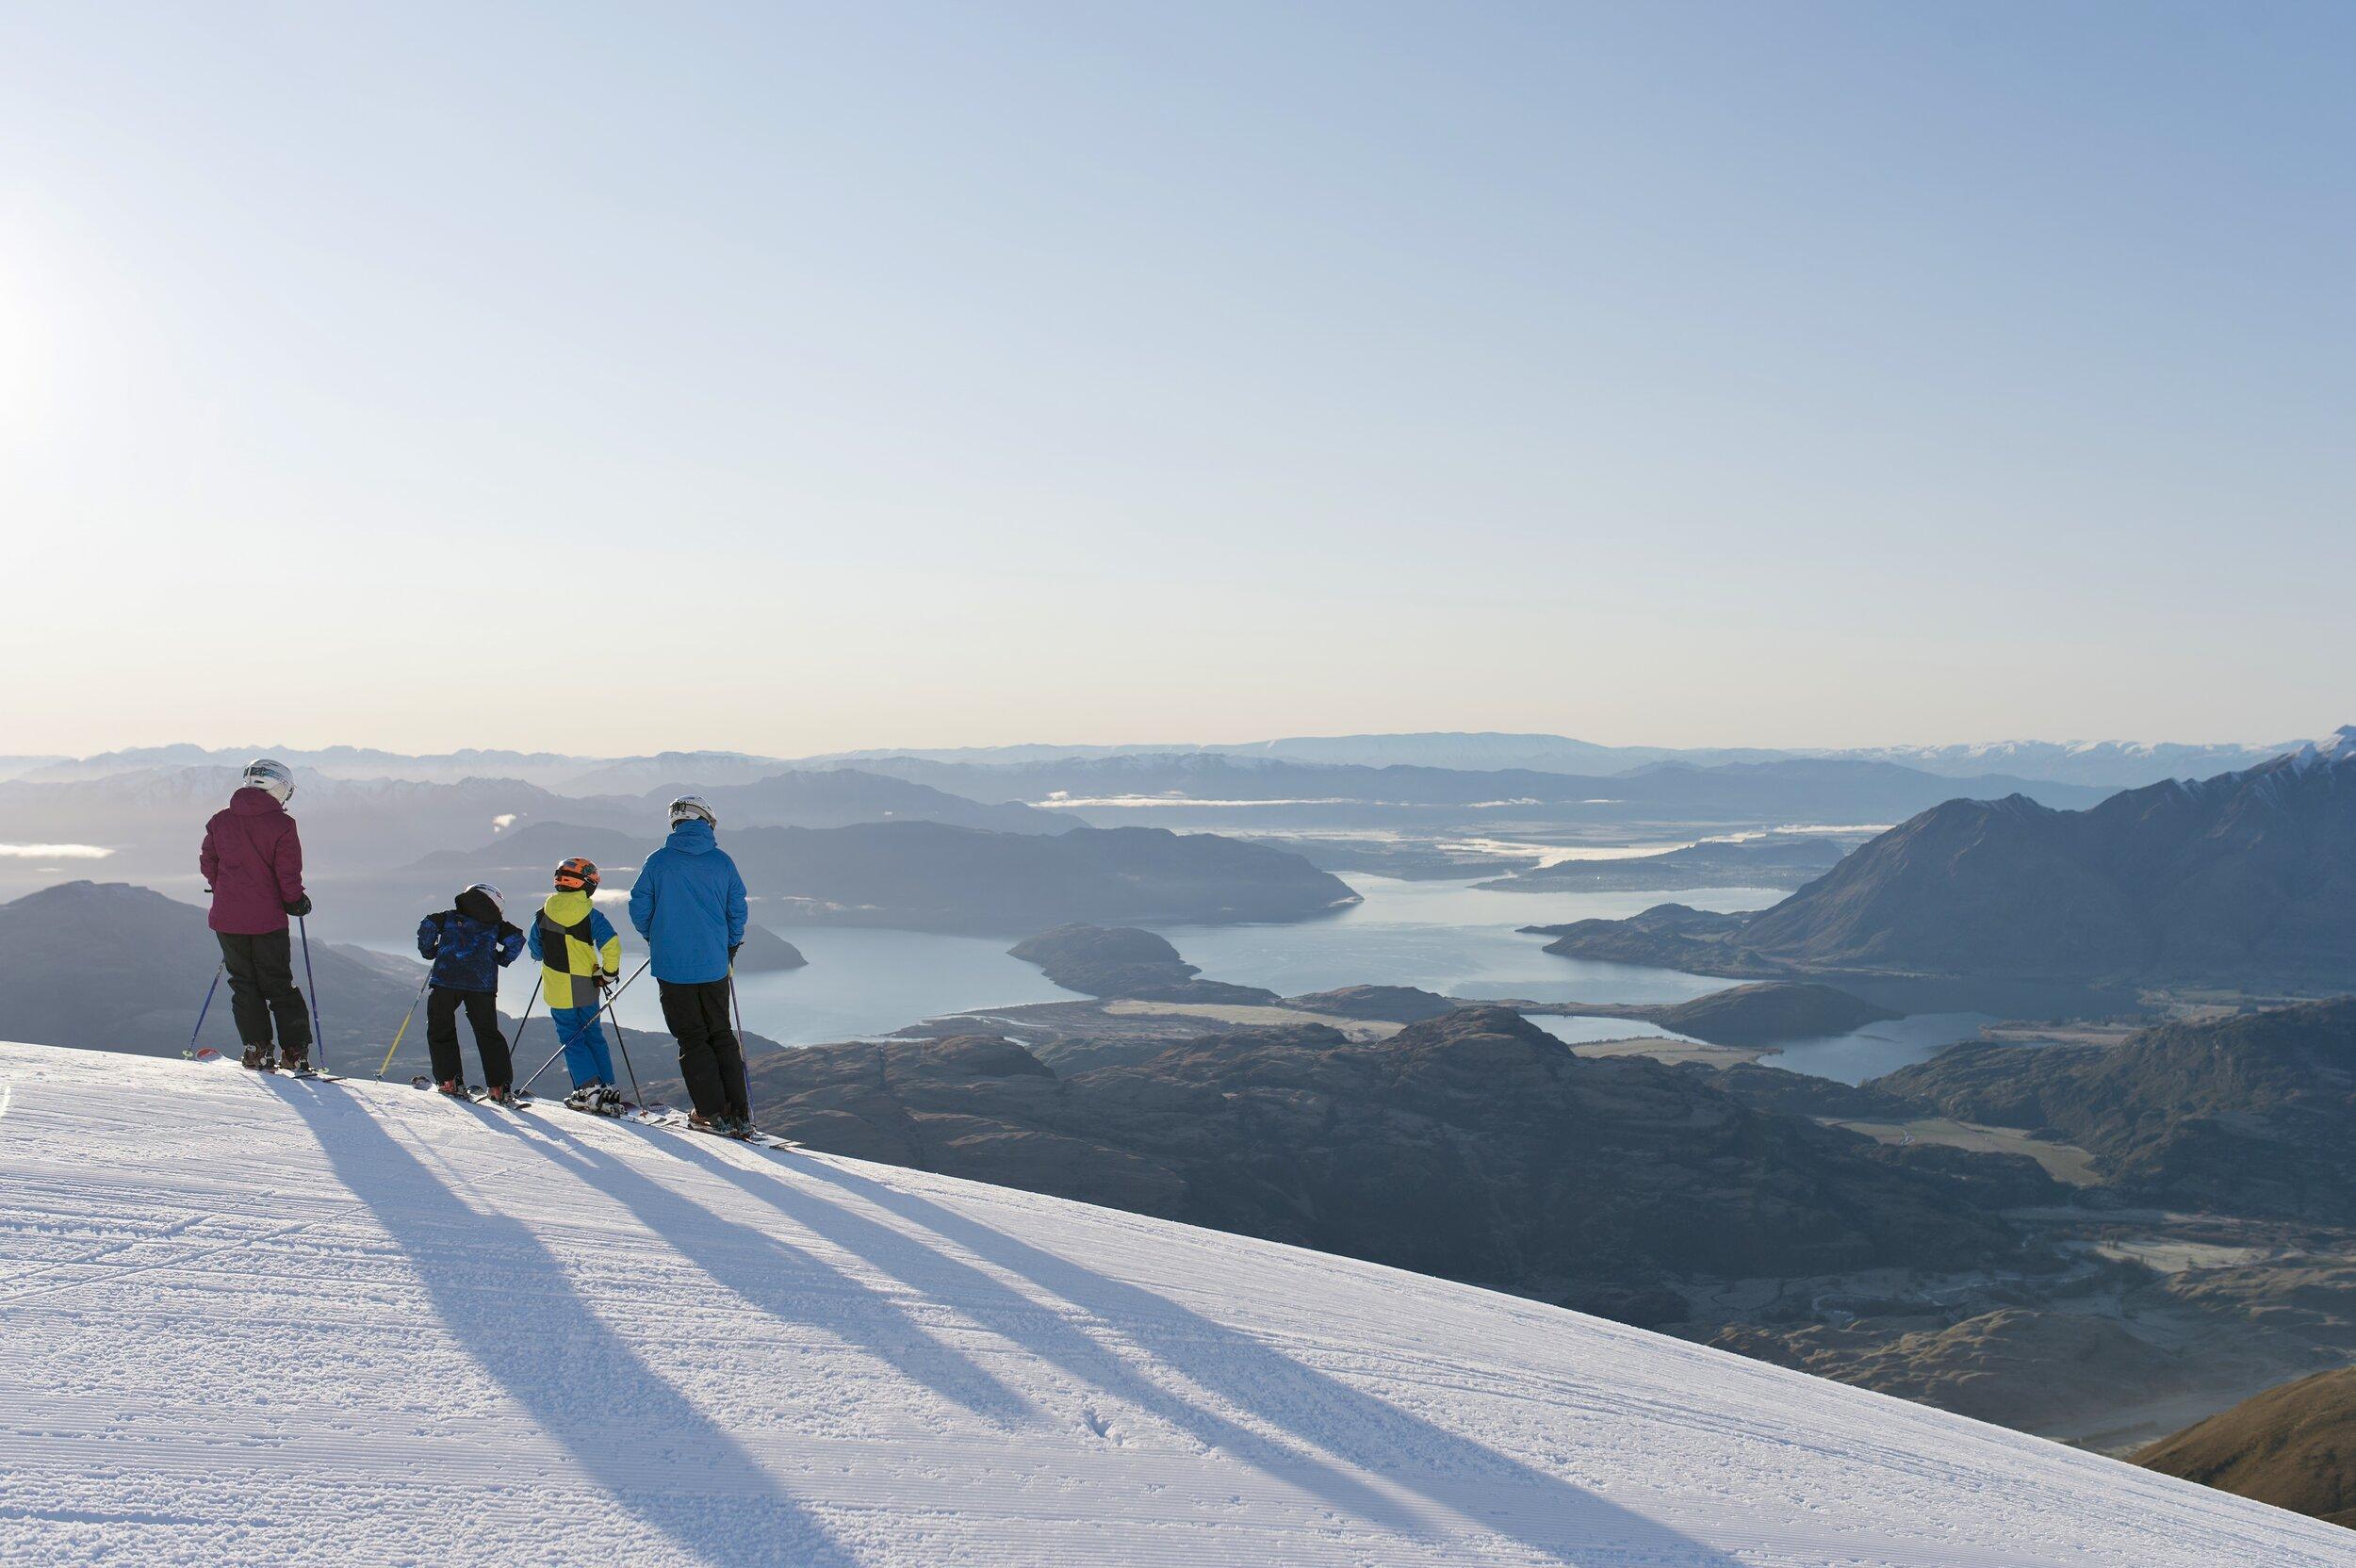 Mabey Ski_New Zealand_Wanaka_Treble Cone_21.jpg